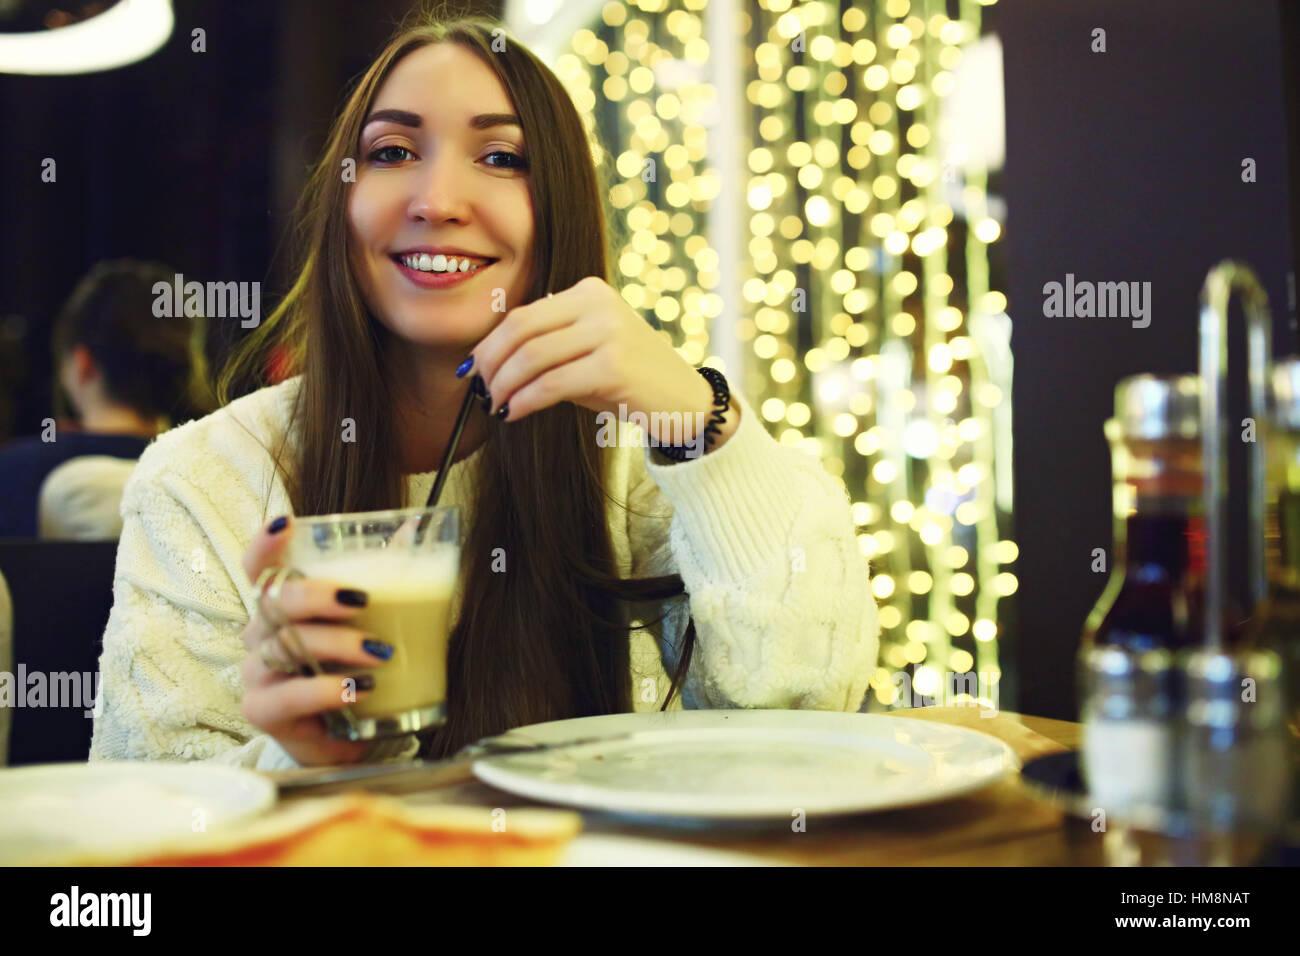 Schöne junge Frau trinken Kaffee im Café. Tonned. Selektiven Fokus. Stockbild